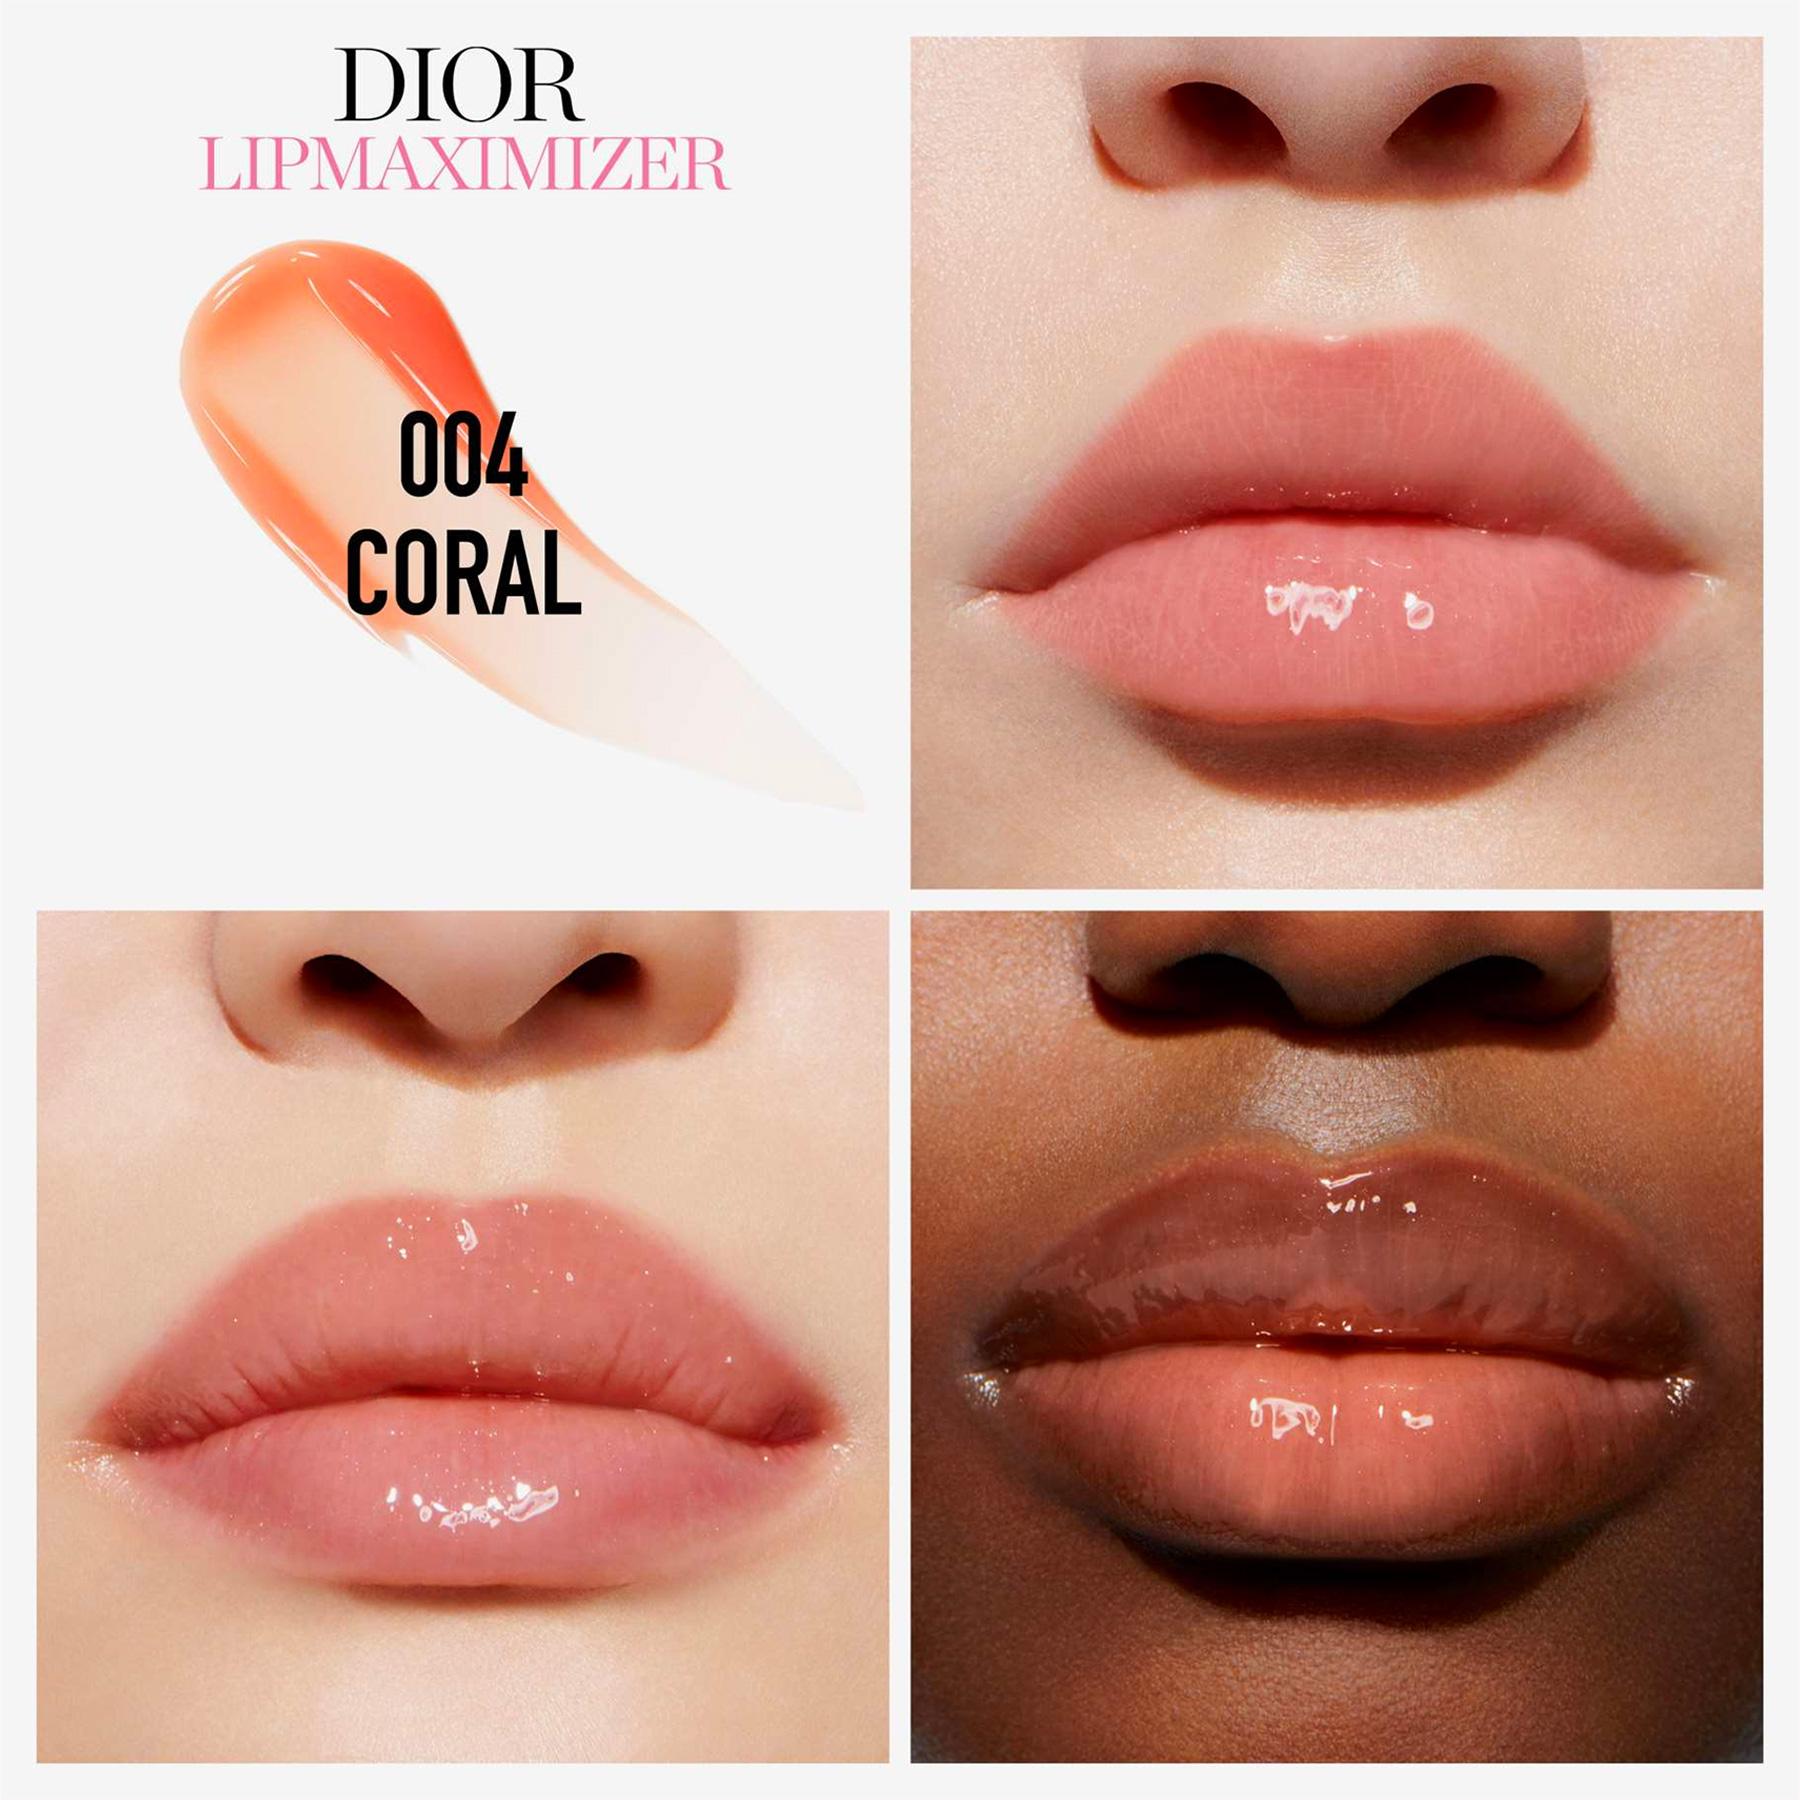 dior lip maximizer coral swatch